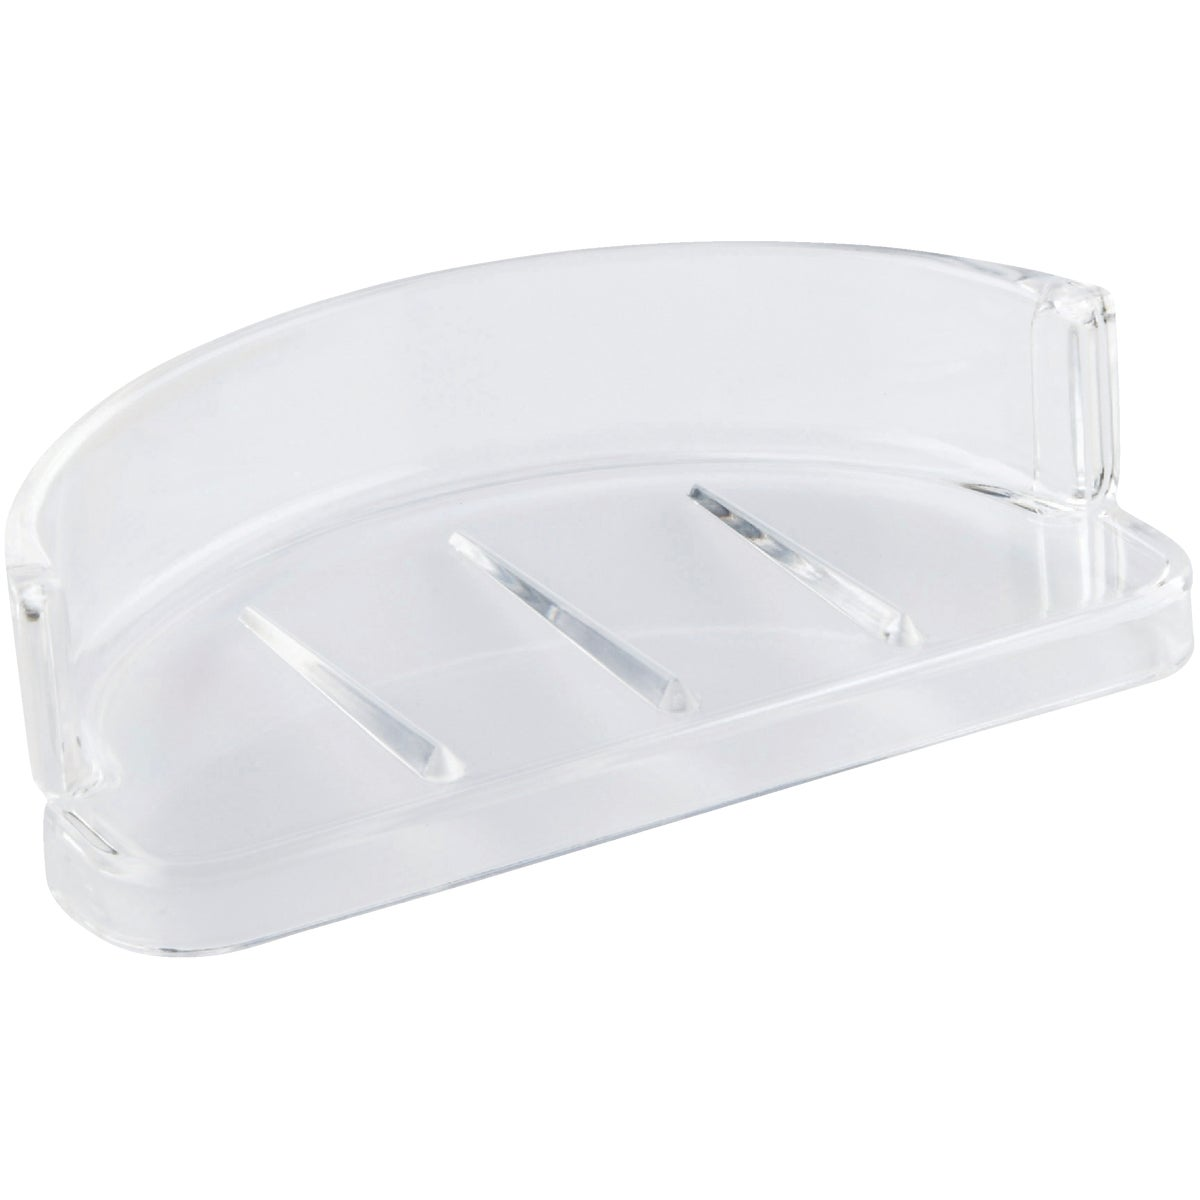 RPLCMENT SOAP DISH